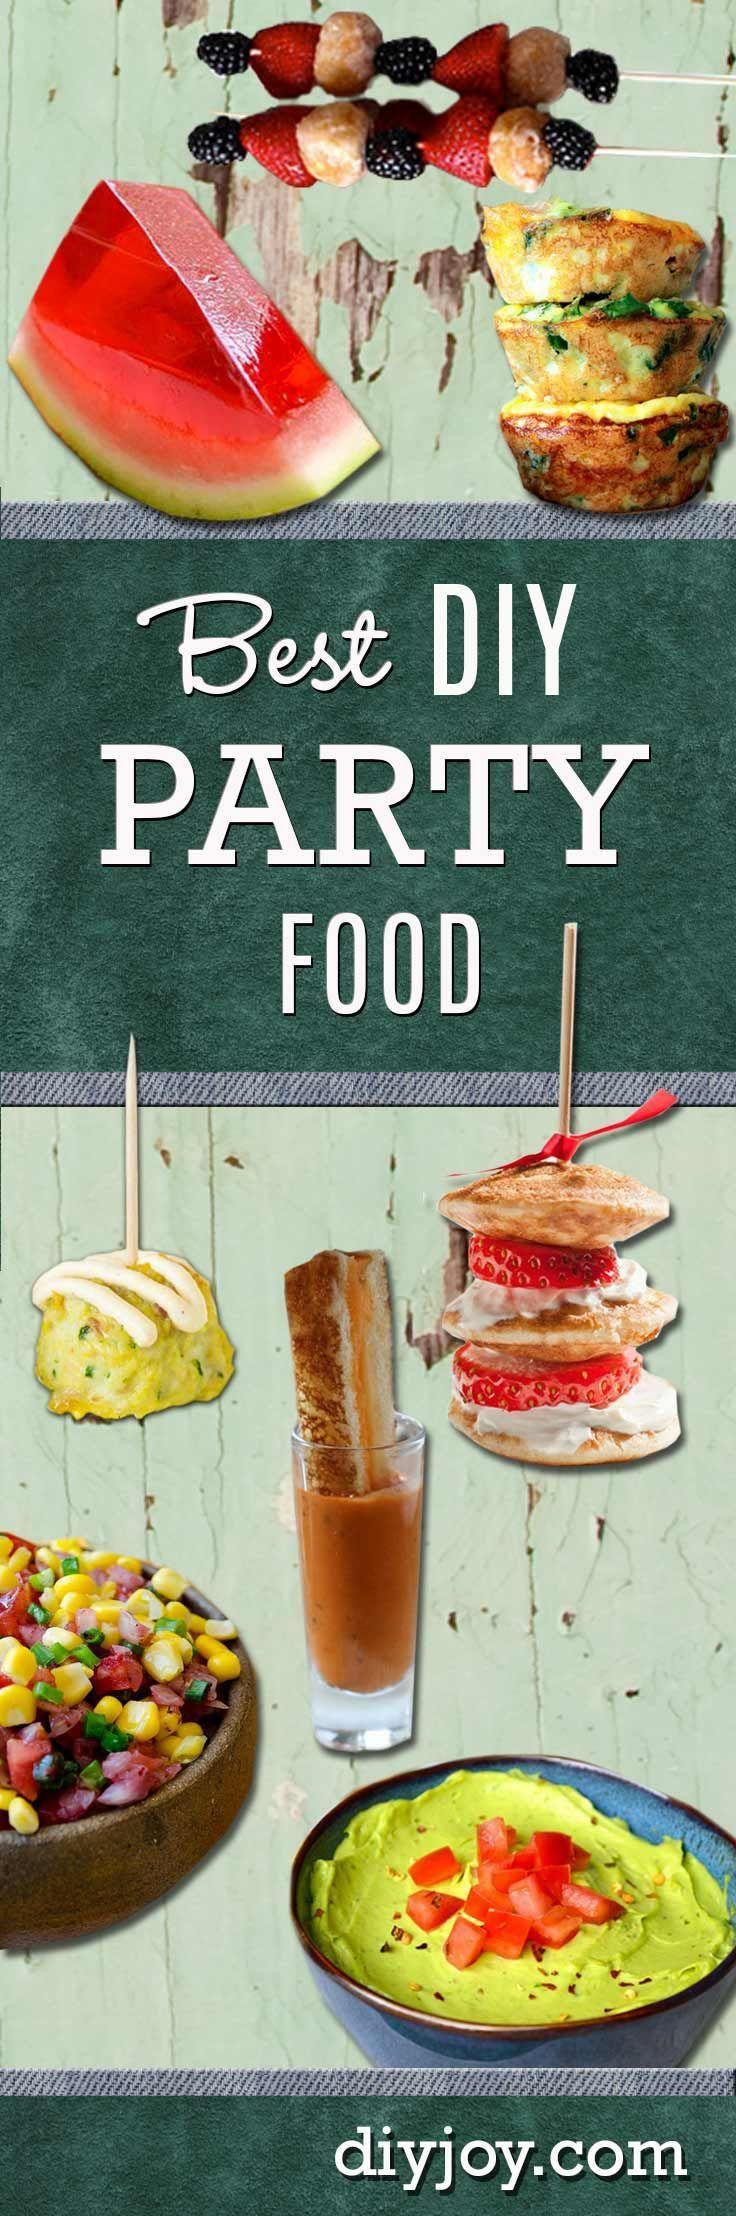 Best DIY Party Food Ideas